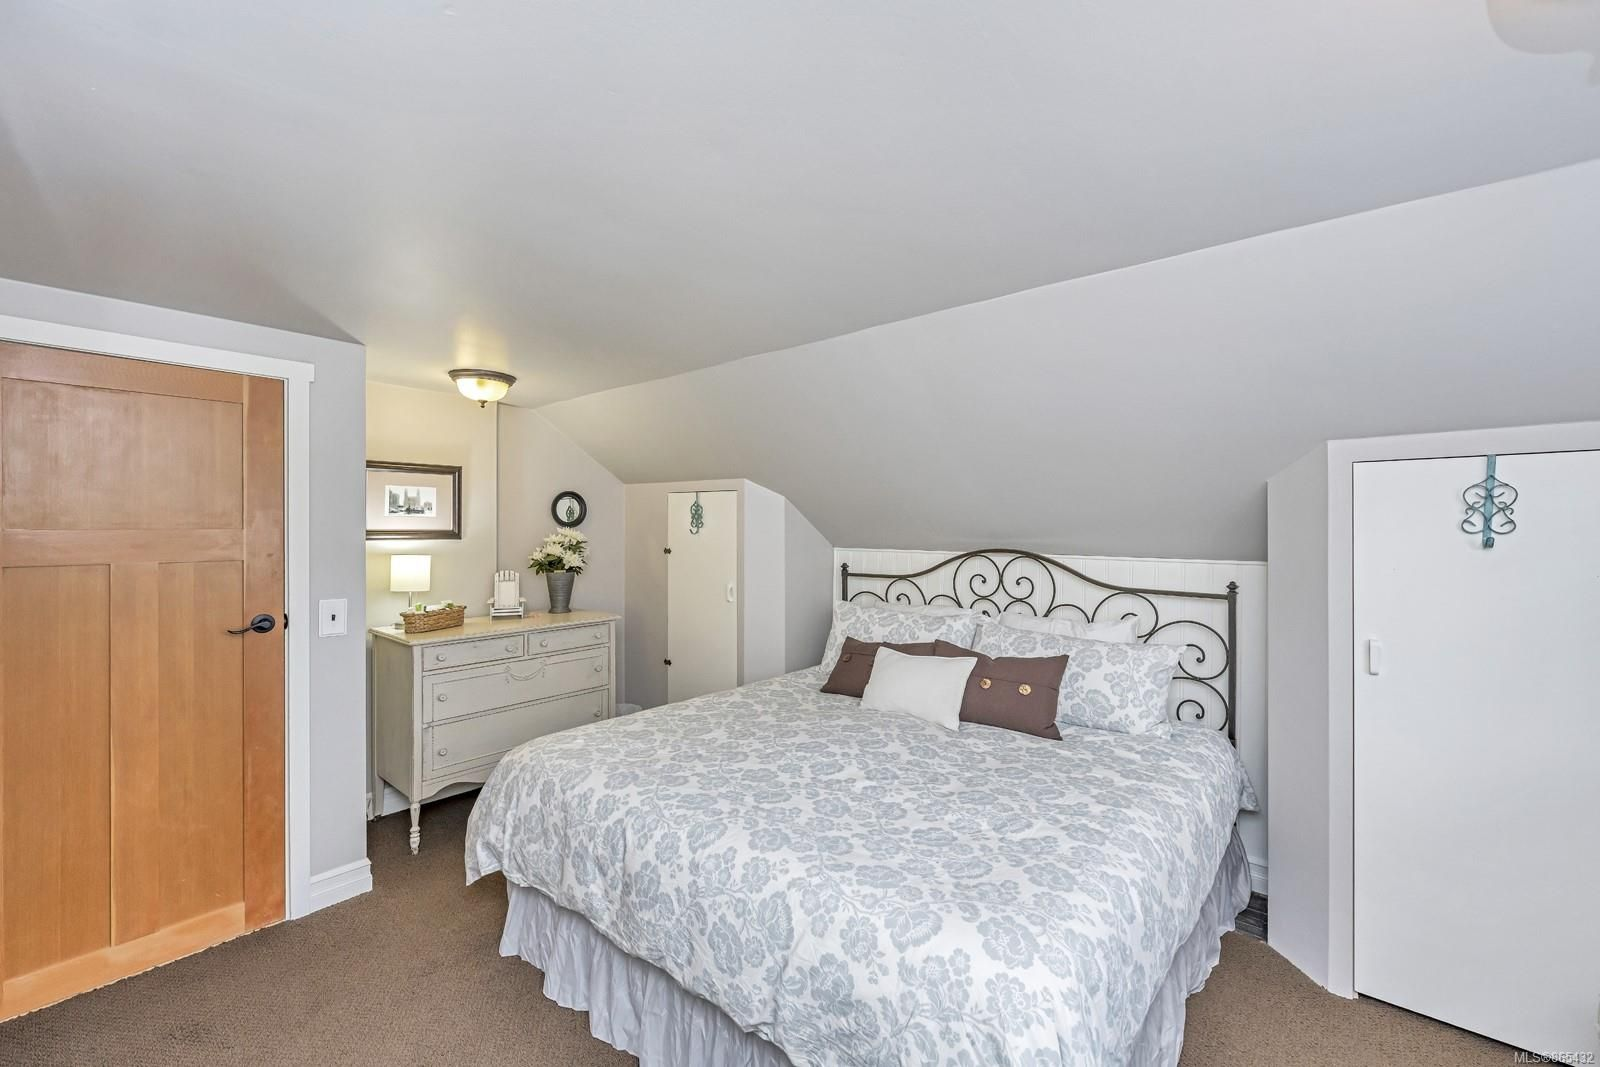 Photo 22: Photos: 6734 Drummond Dr in : Du East Duncan House for sale (Duncan)  : MLS®# 865432